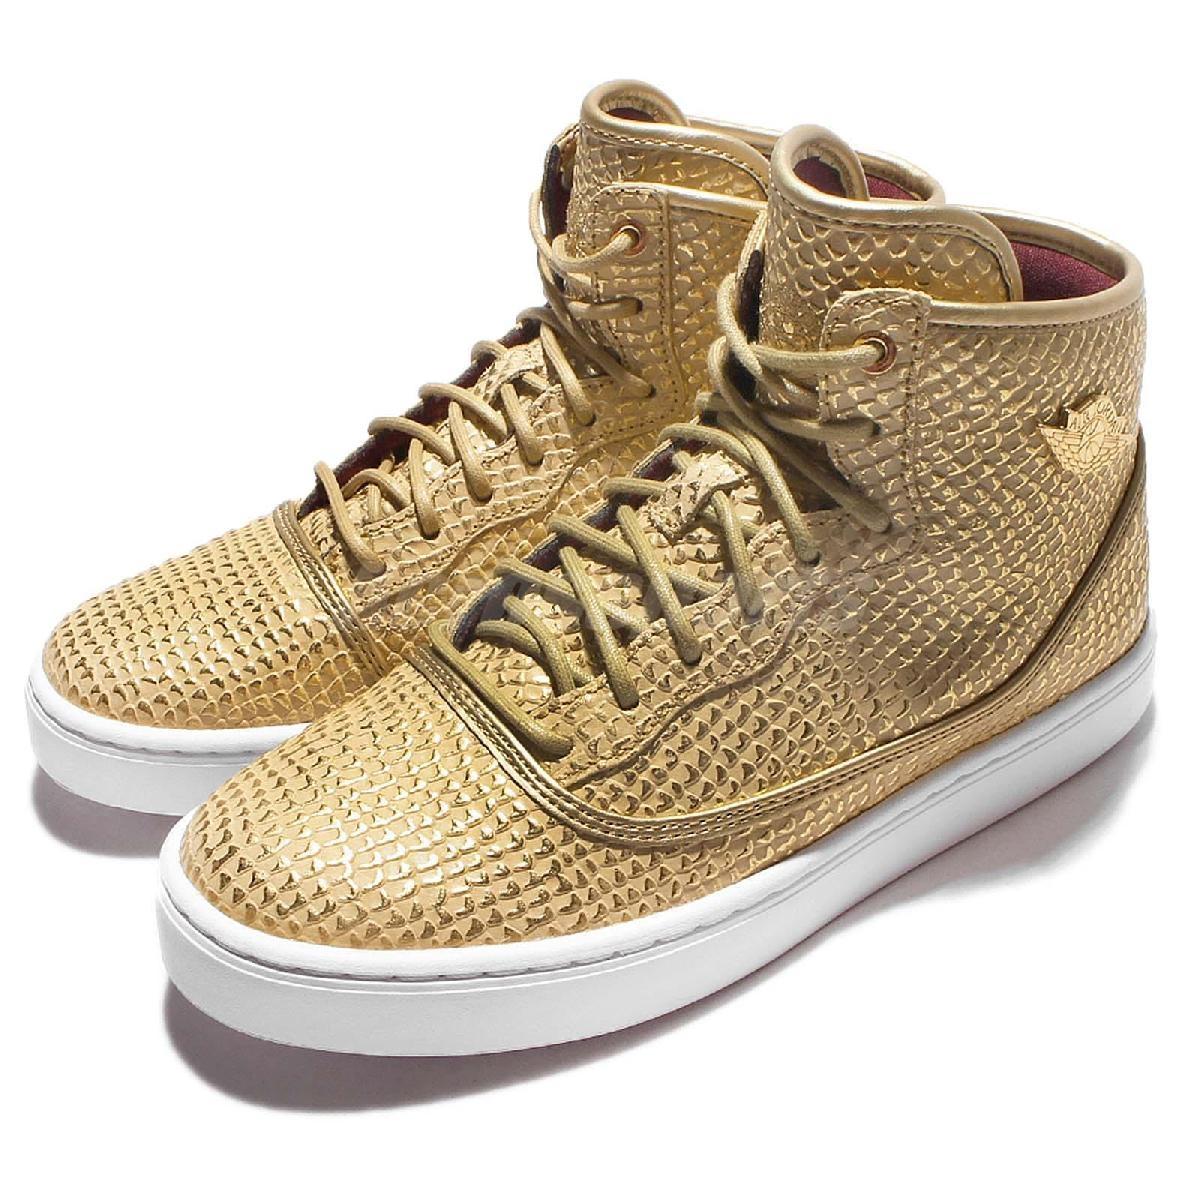 Nike籃球鞋Jordan Jasmine PREM HC GG金白底金牌蛇紋女鞋大童鞋PUMP306 807711-709